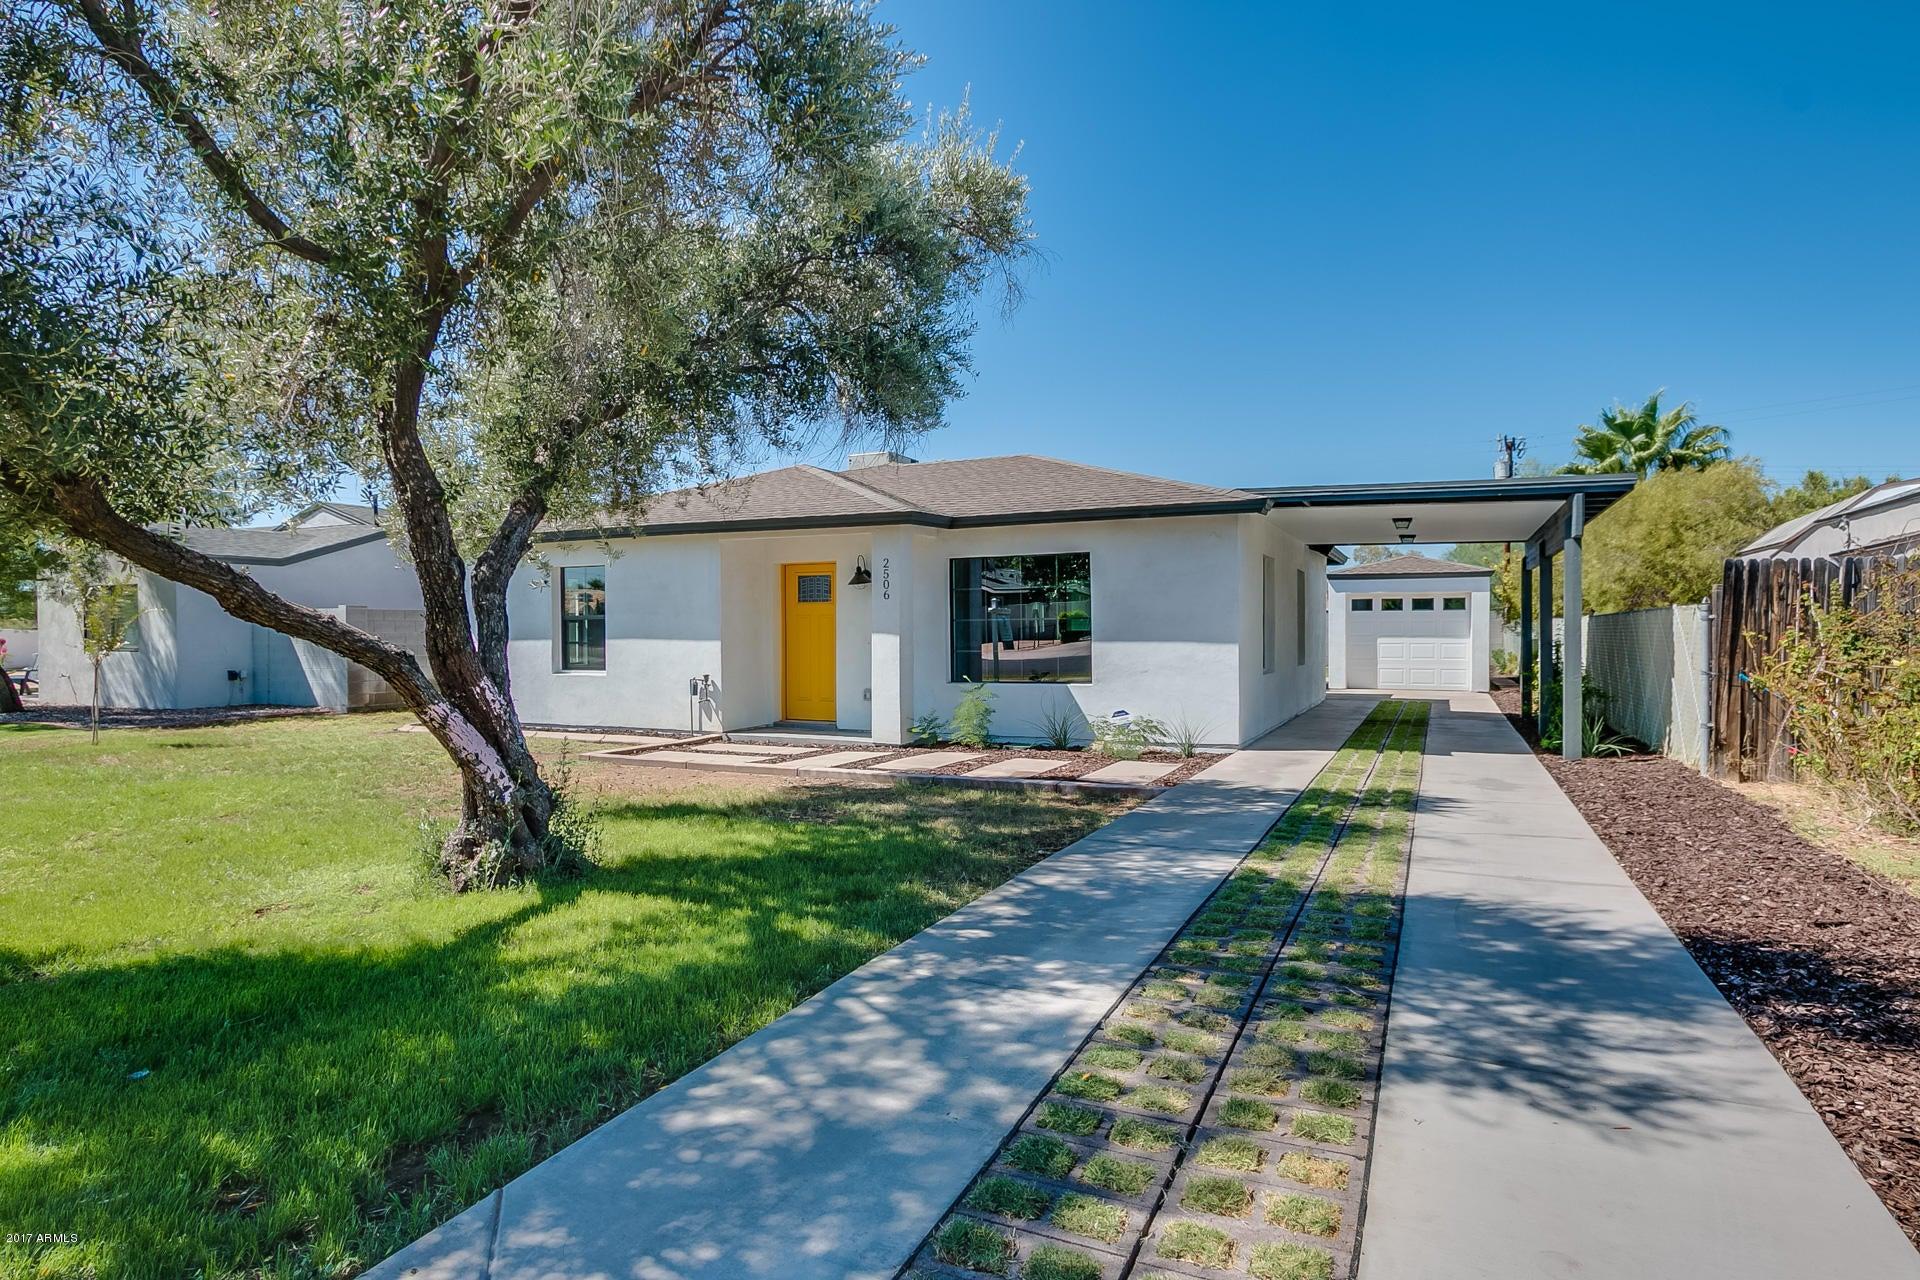 2506 N EVERGREEN Street, Phoenix, AZ 85006